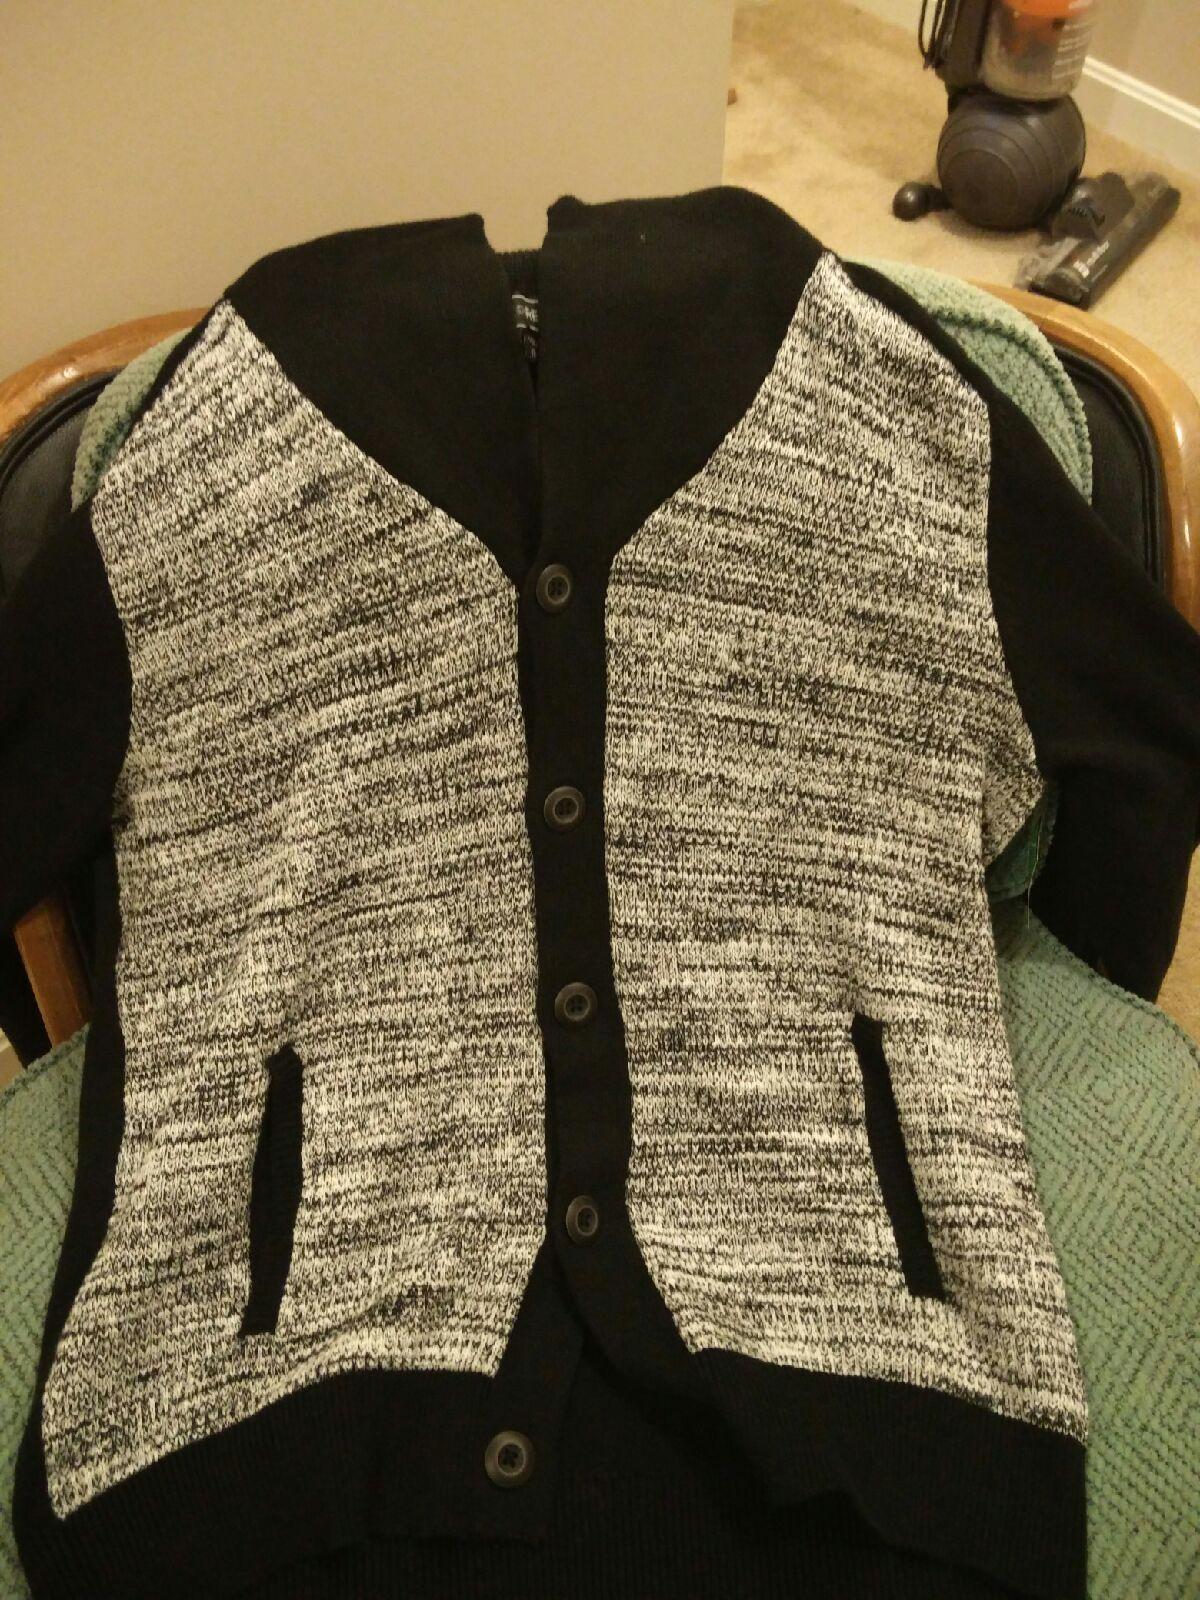 Express Men's Cardigan Sweater XL - Mercari: BUY & SELL THINGS YOU ...